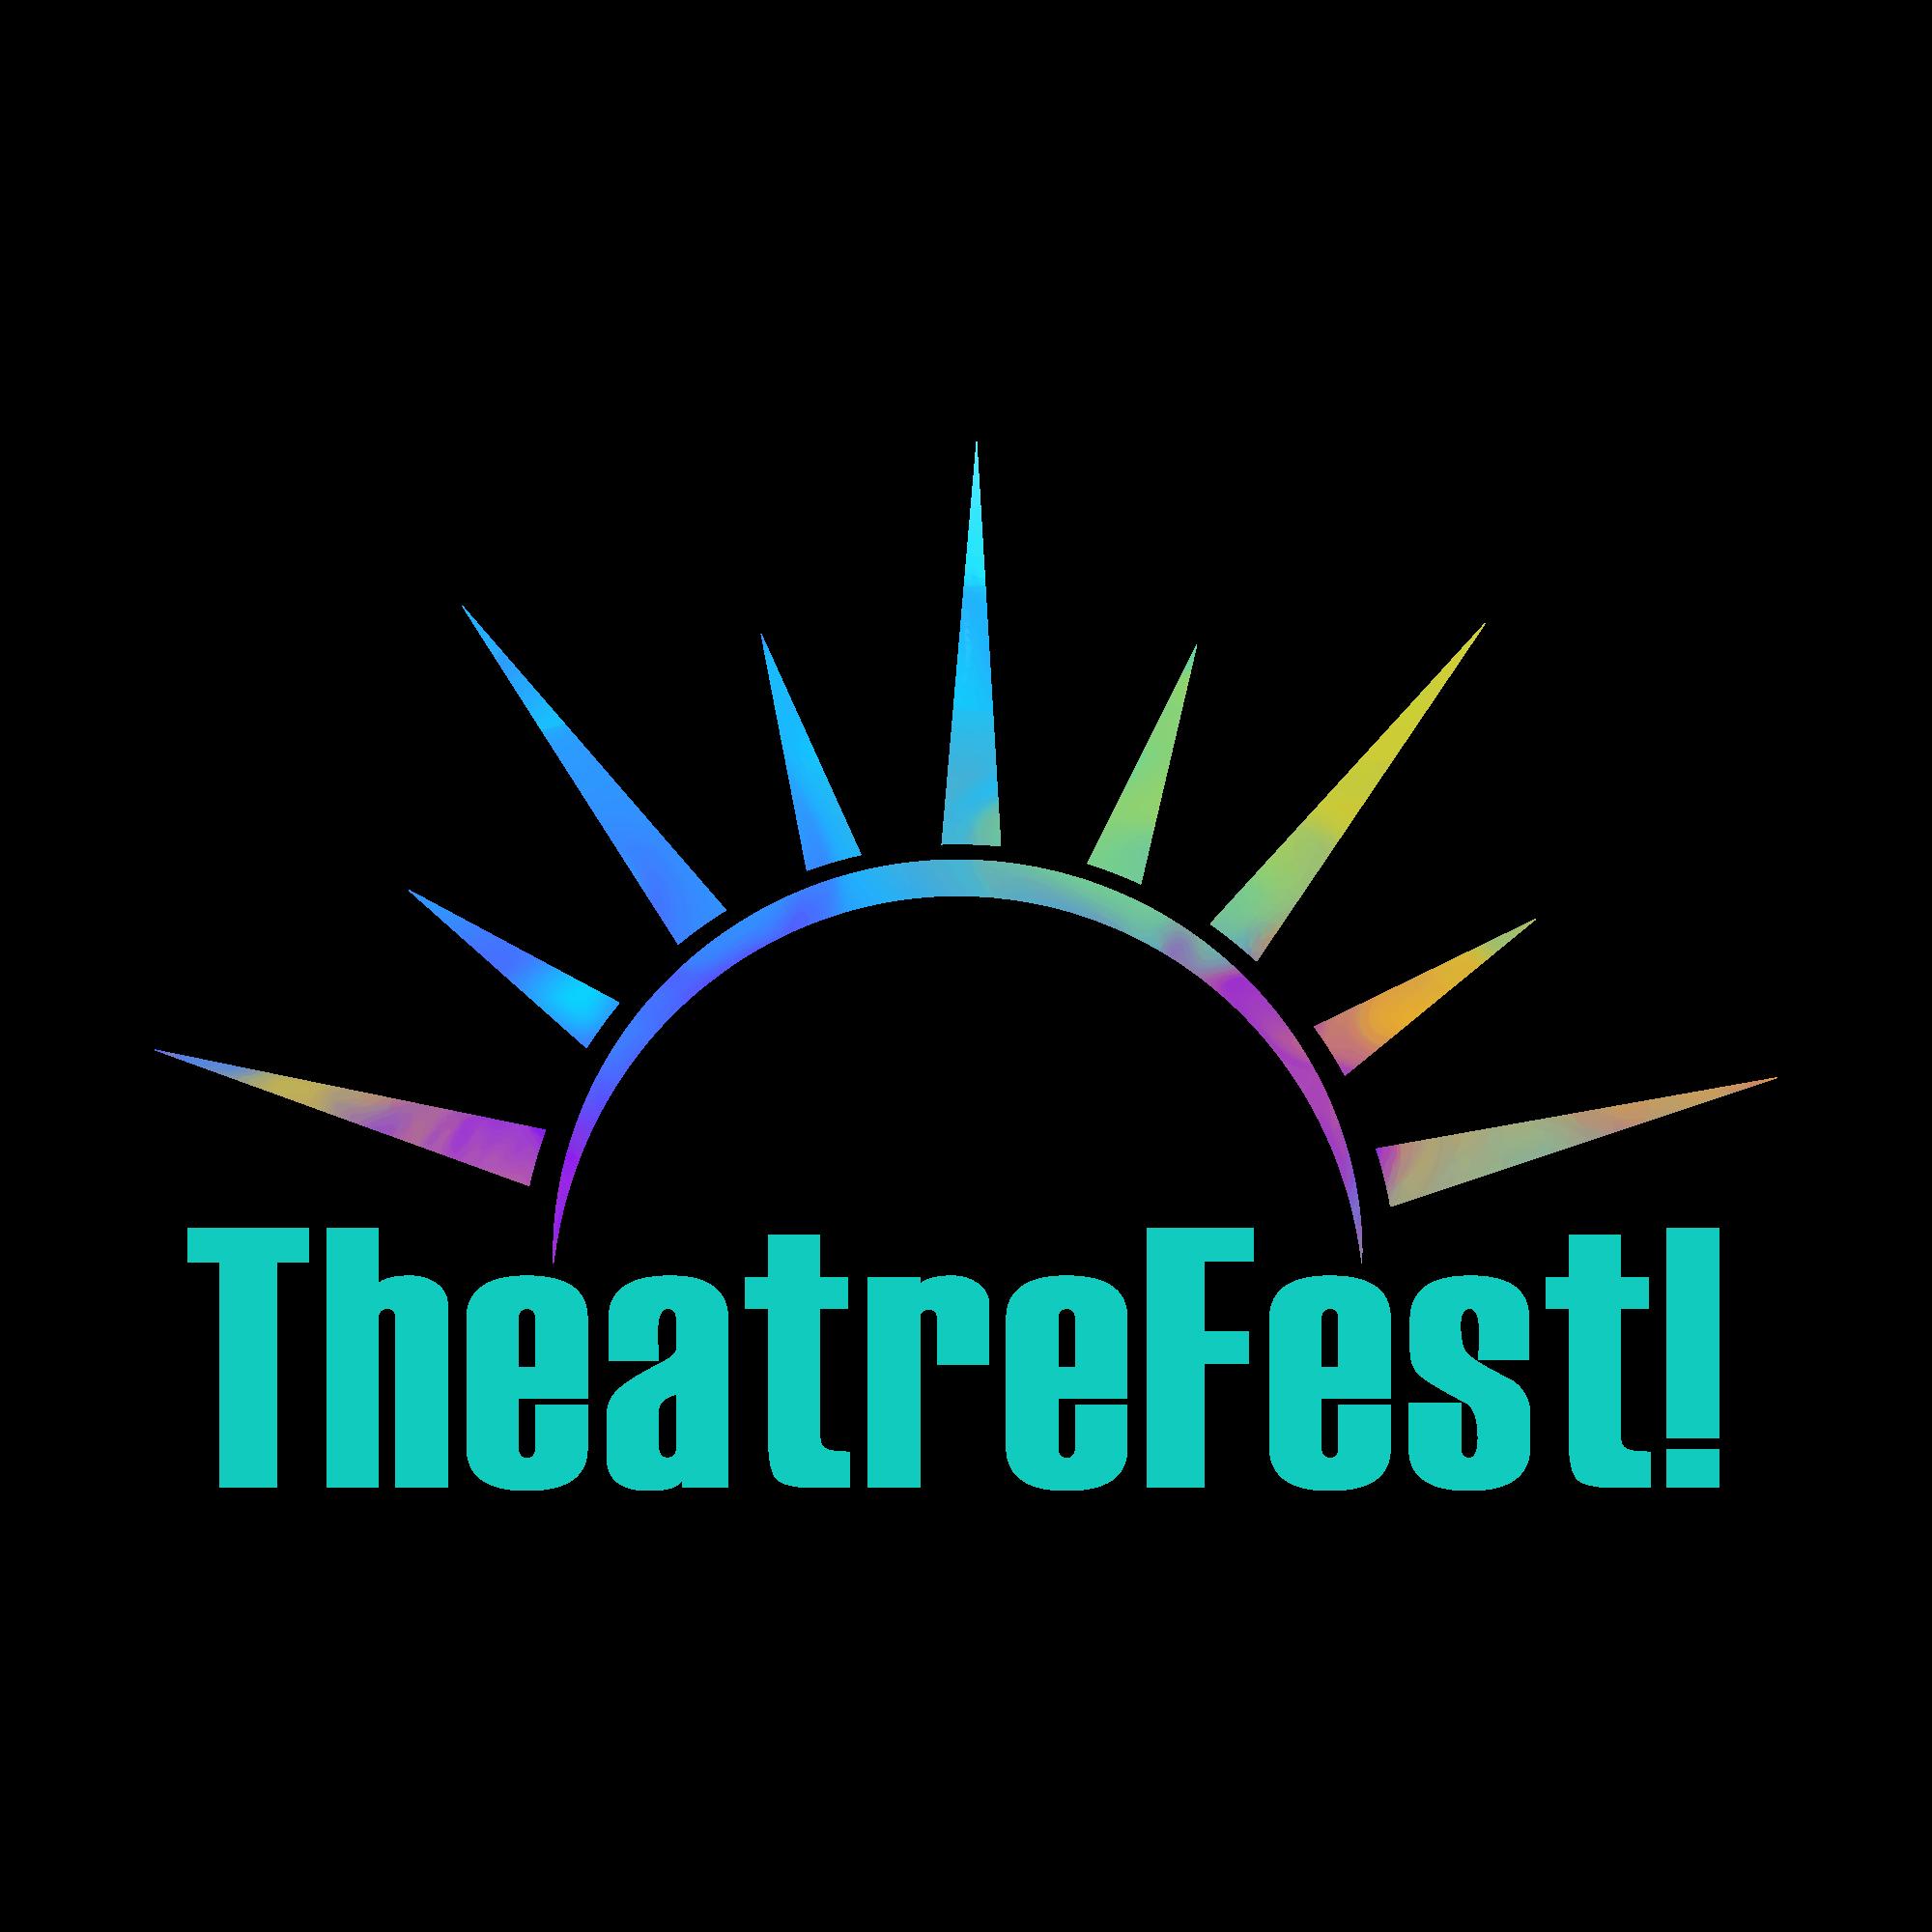 TheatreFest!-B1.png